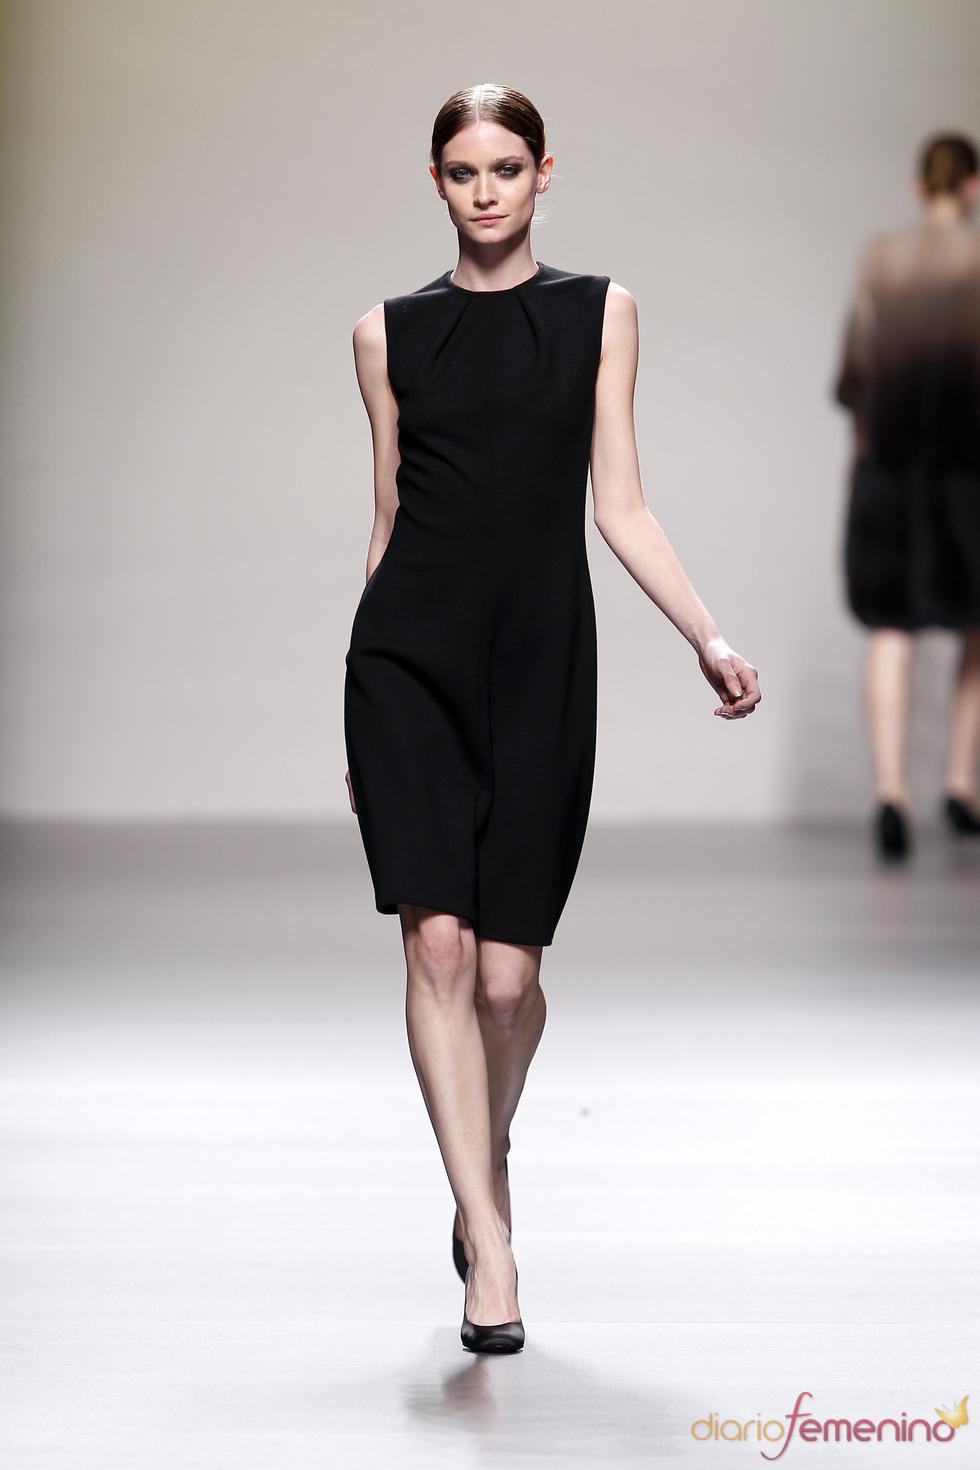 Lemoniez en Cibeles Madrid Fashion Week